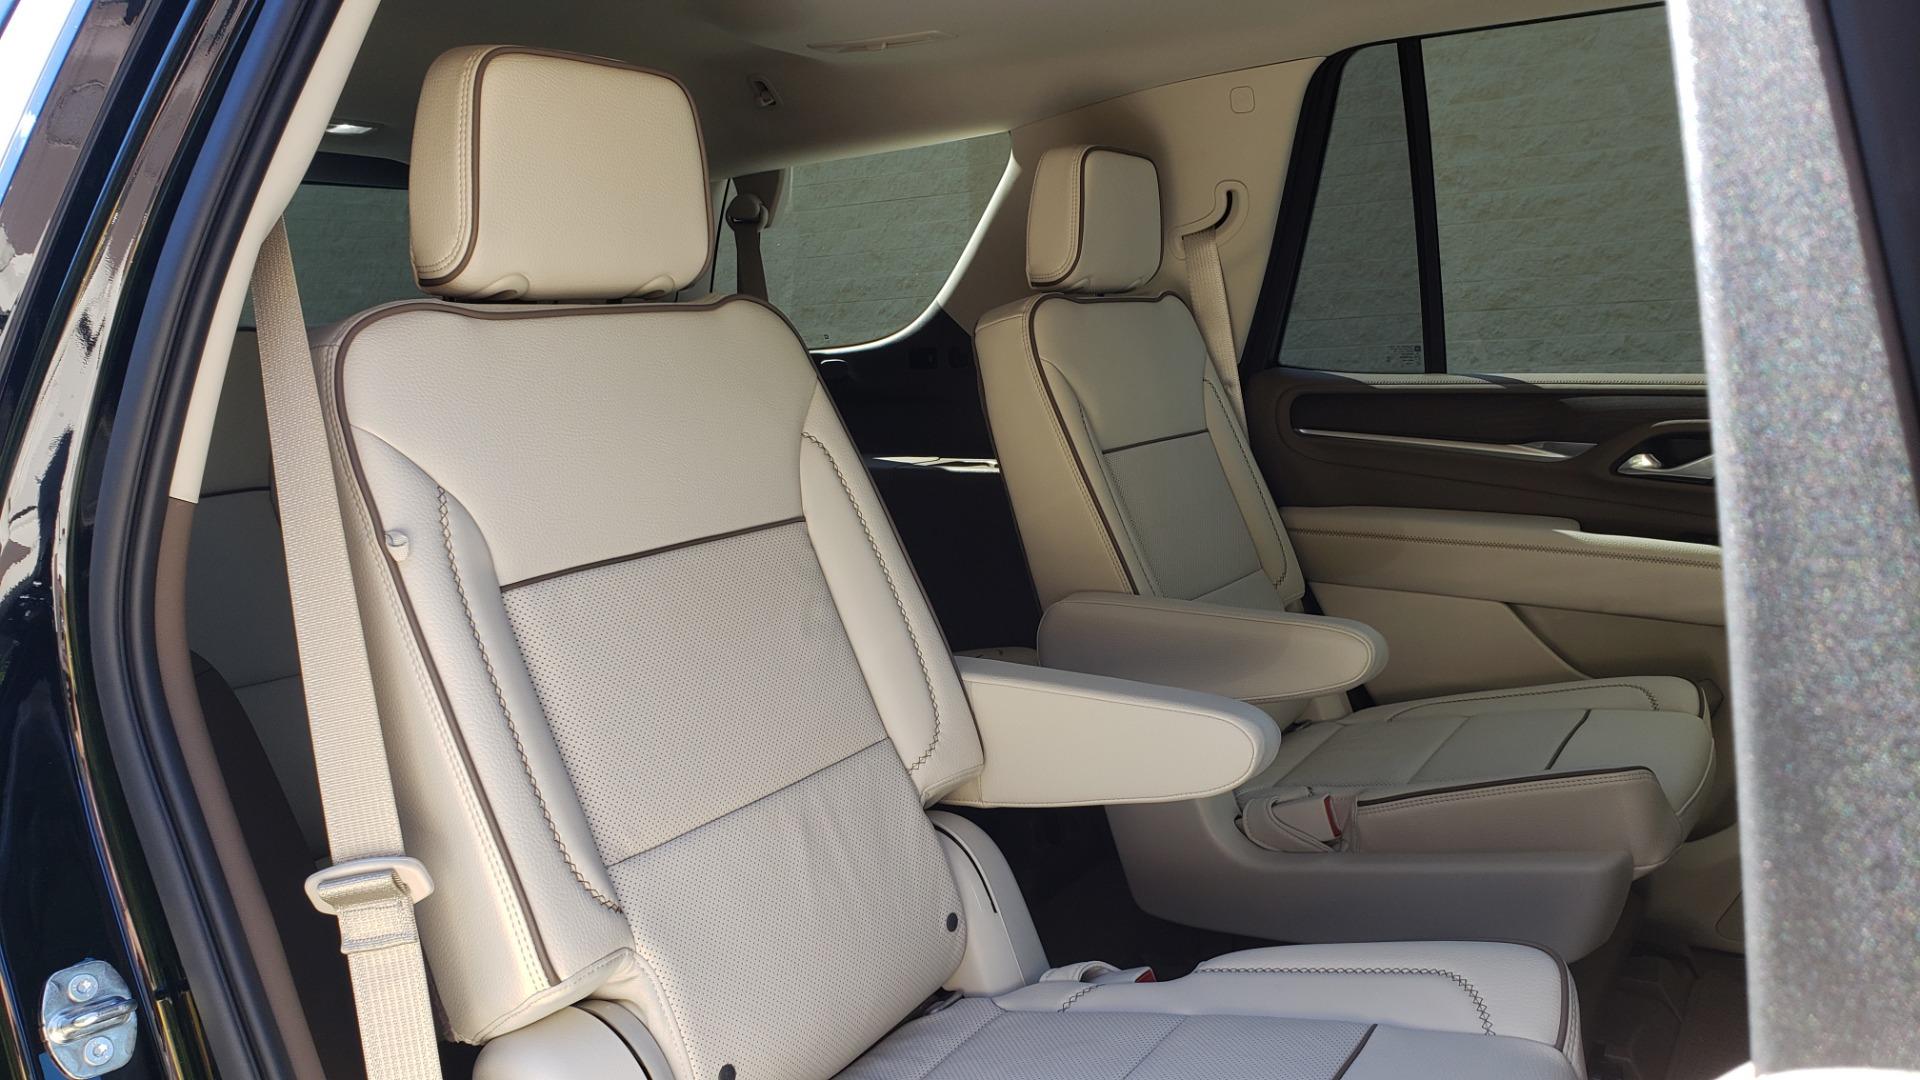 Used 2021 GMC YUKON DENALI PREMIUM 4WD / NAV / ADVANCED TECH / ENTERTAINMENT for sale Sold at Formula Imports in Charlotte NC 28227 92